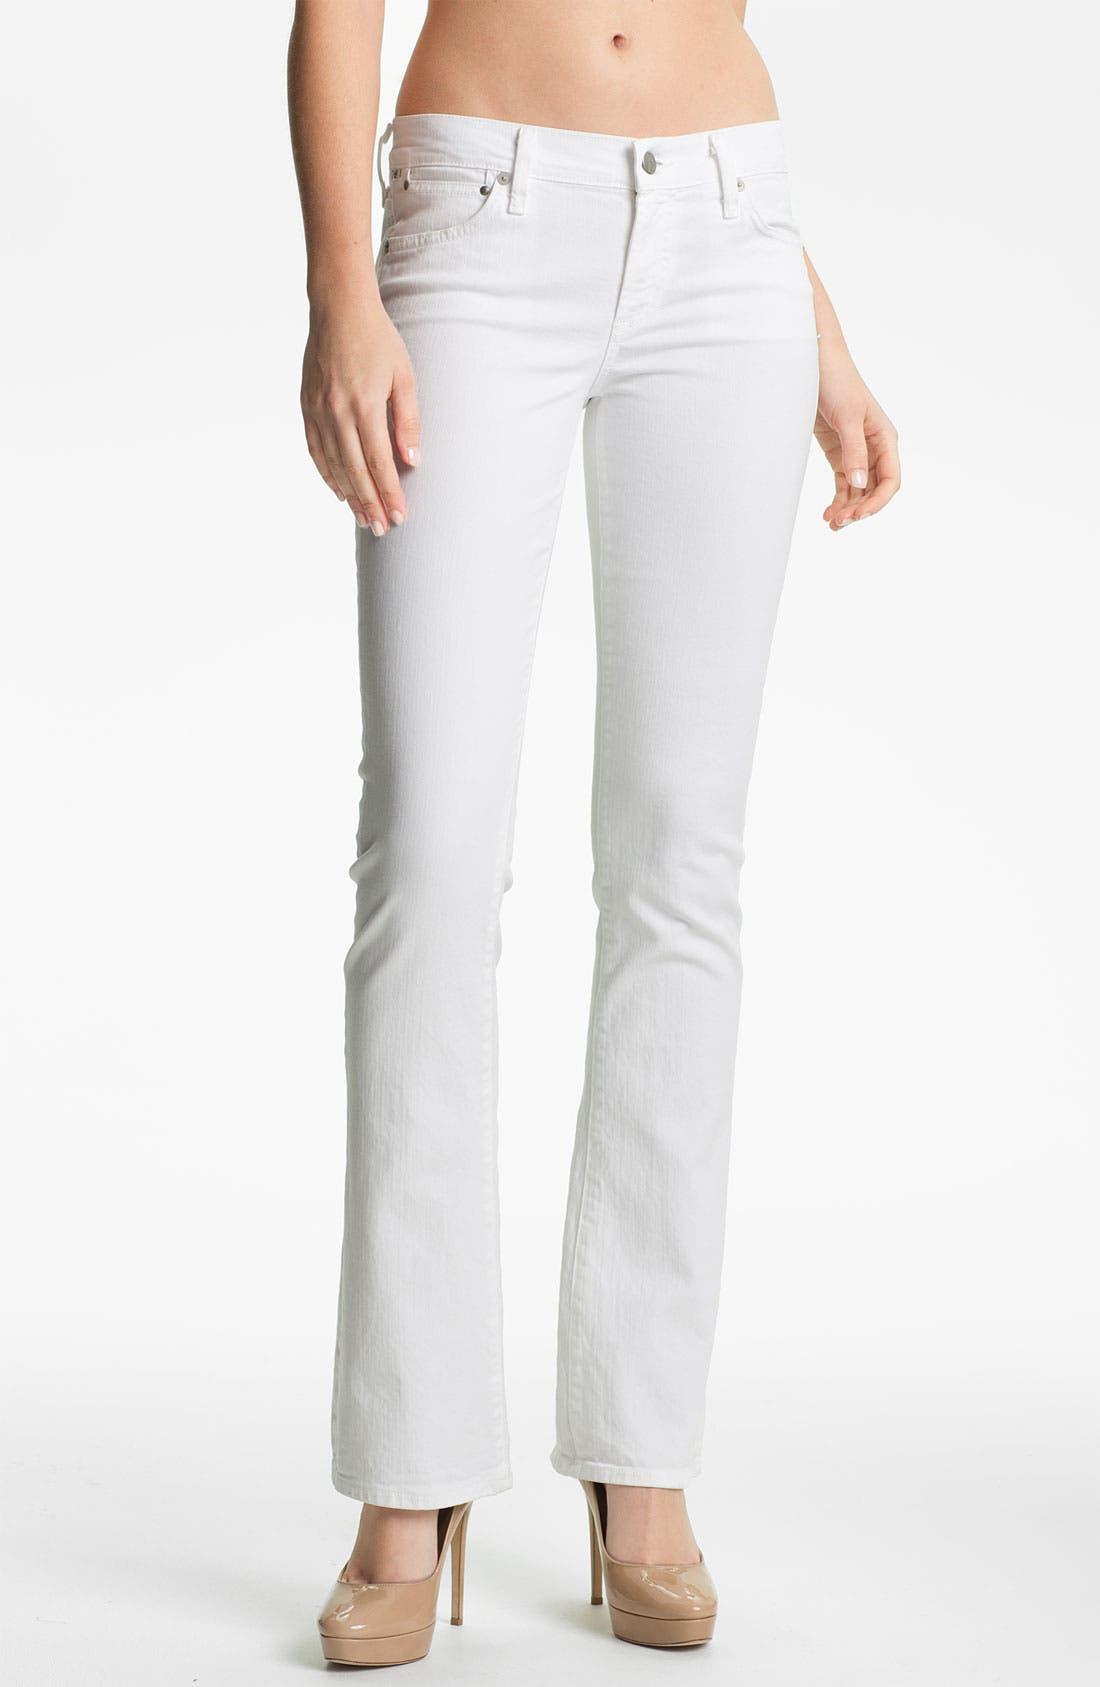 Main Image - Citizens of Humanity 'Emmanuelle' Slim Bootcut Jeans (Santorini)